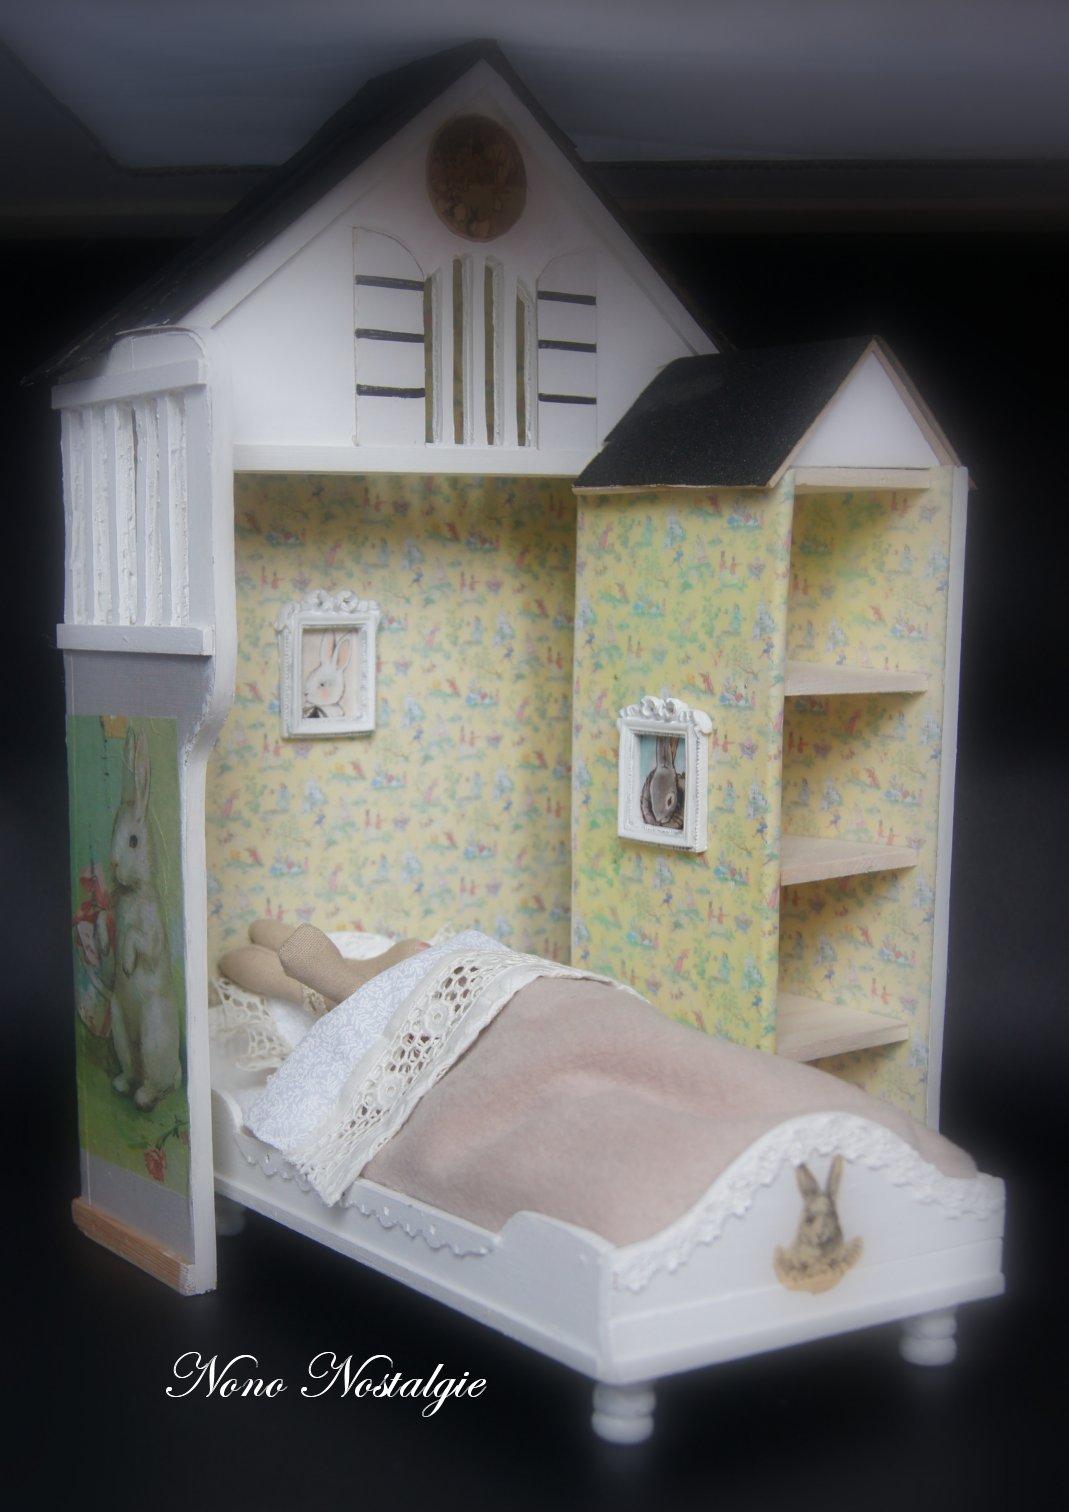 Nono mini nostalgie coin de chambre pour lapin calin for Chambre pour